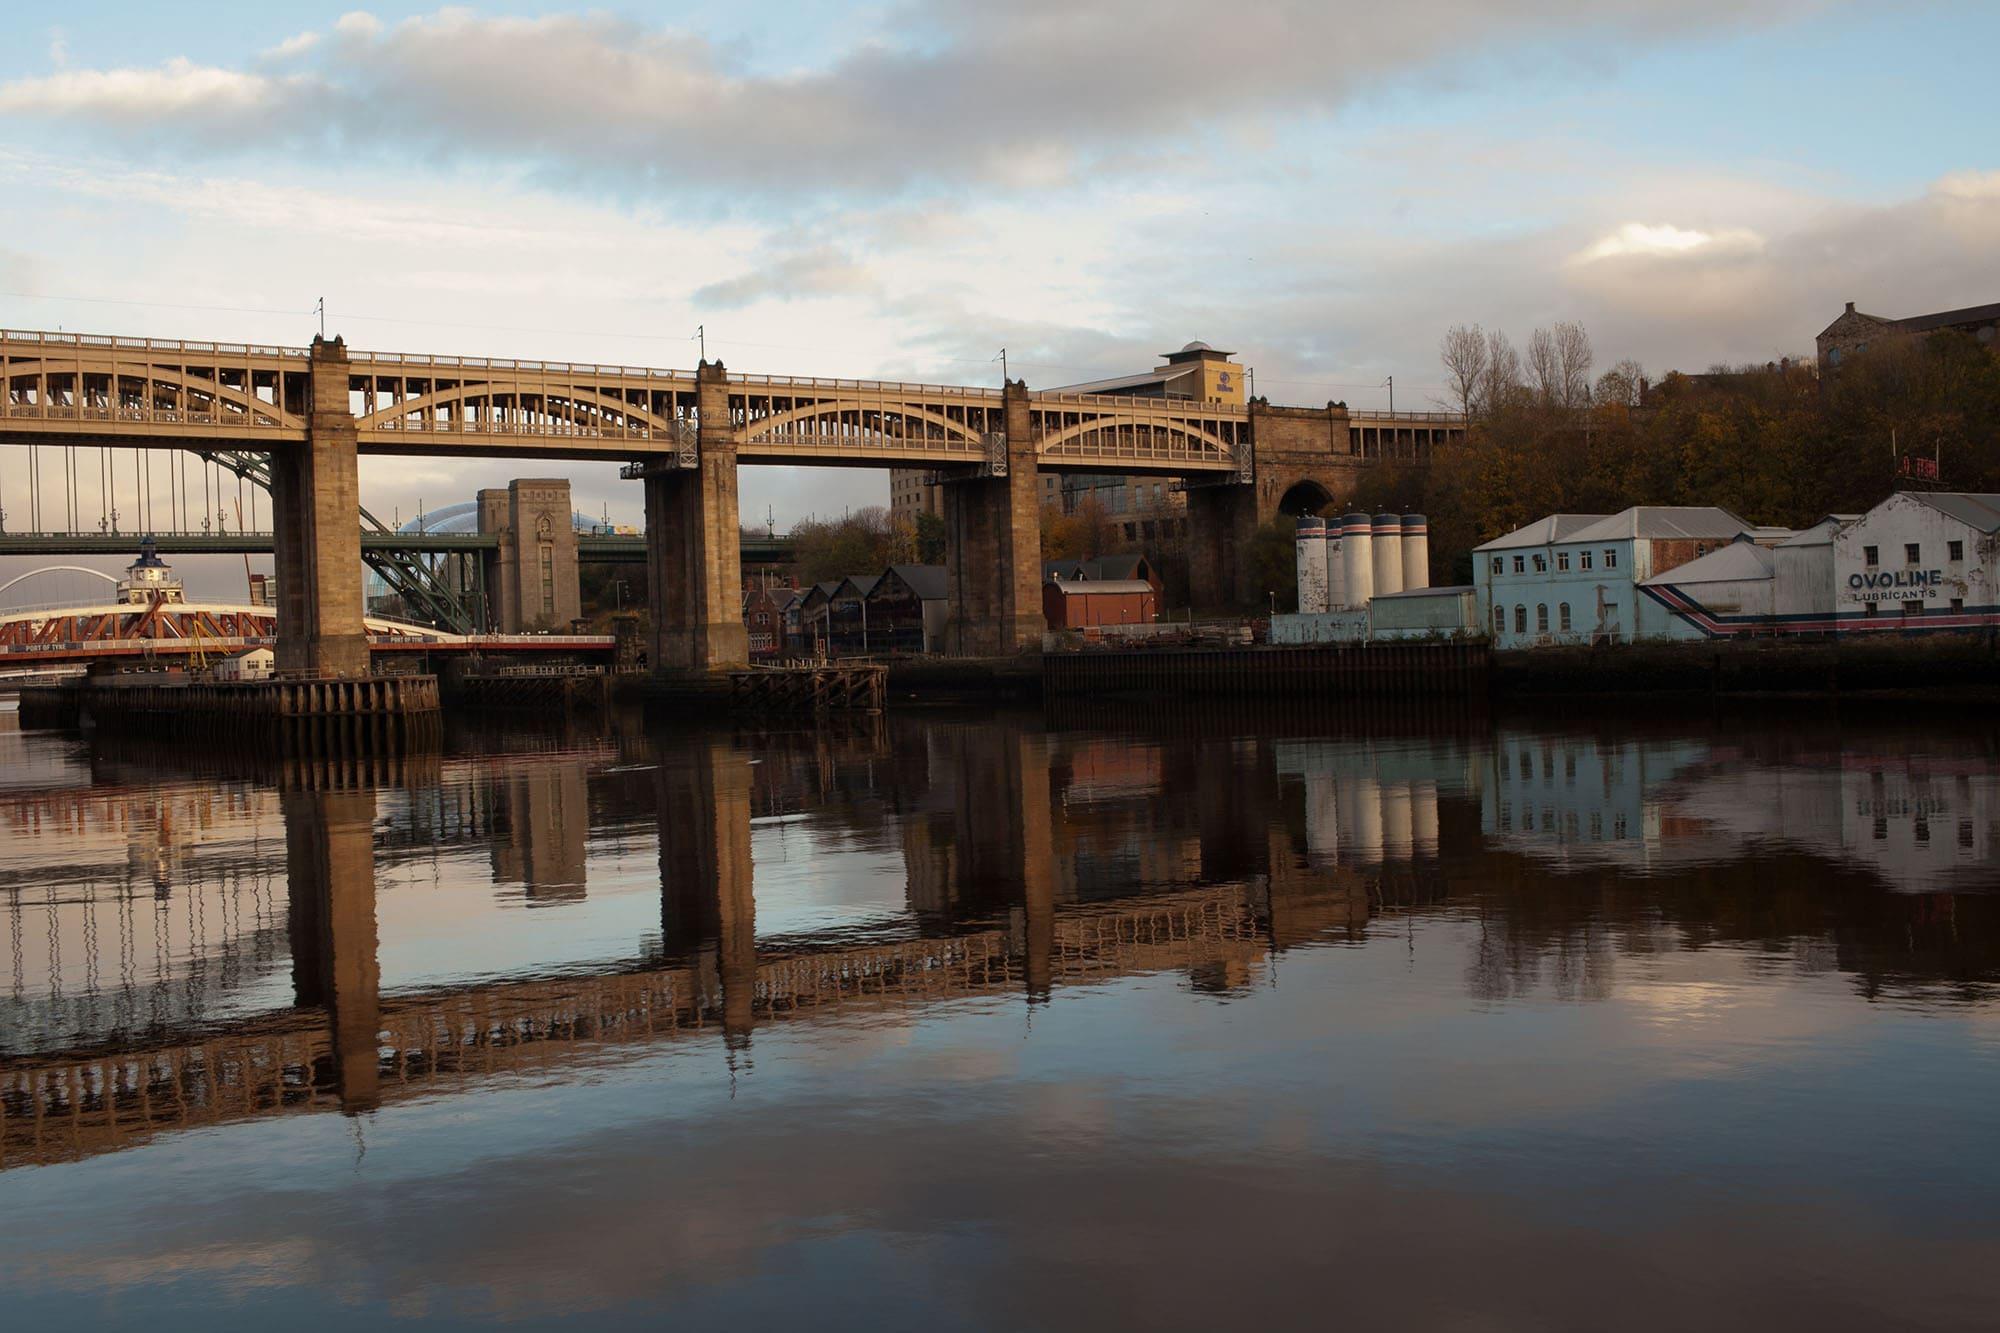 High Level Bridge in Newcastle, England